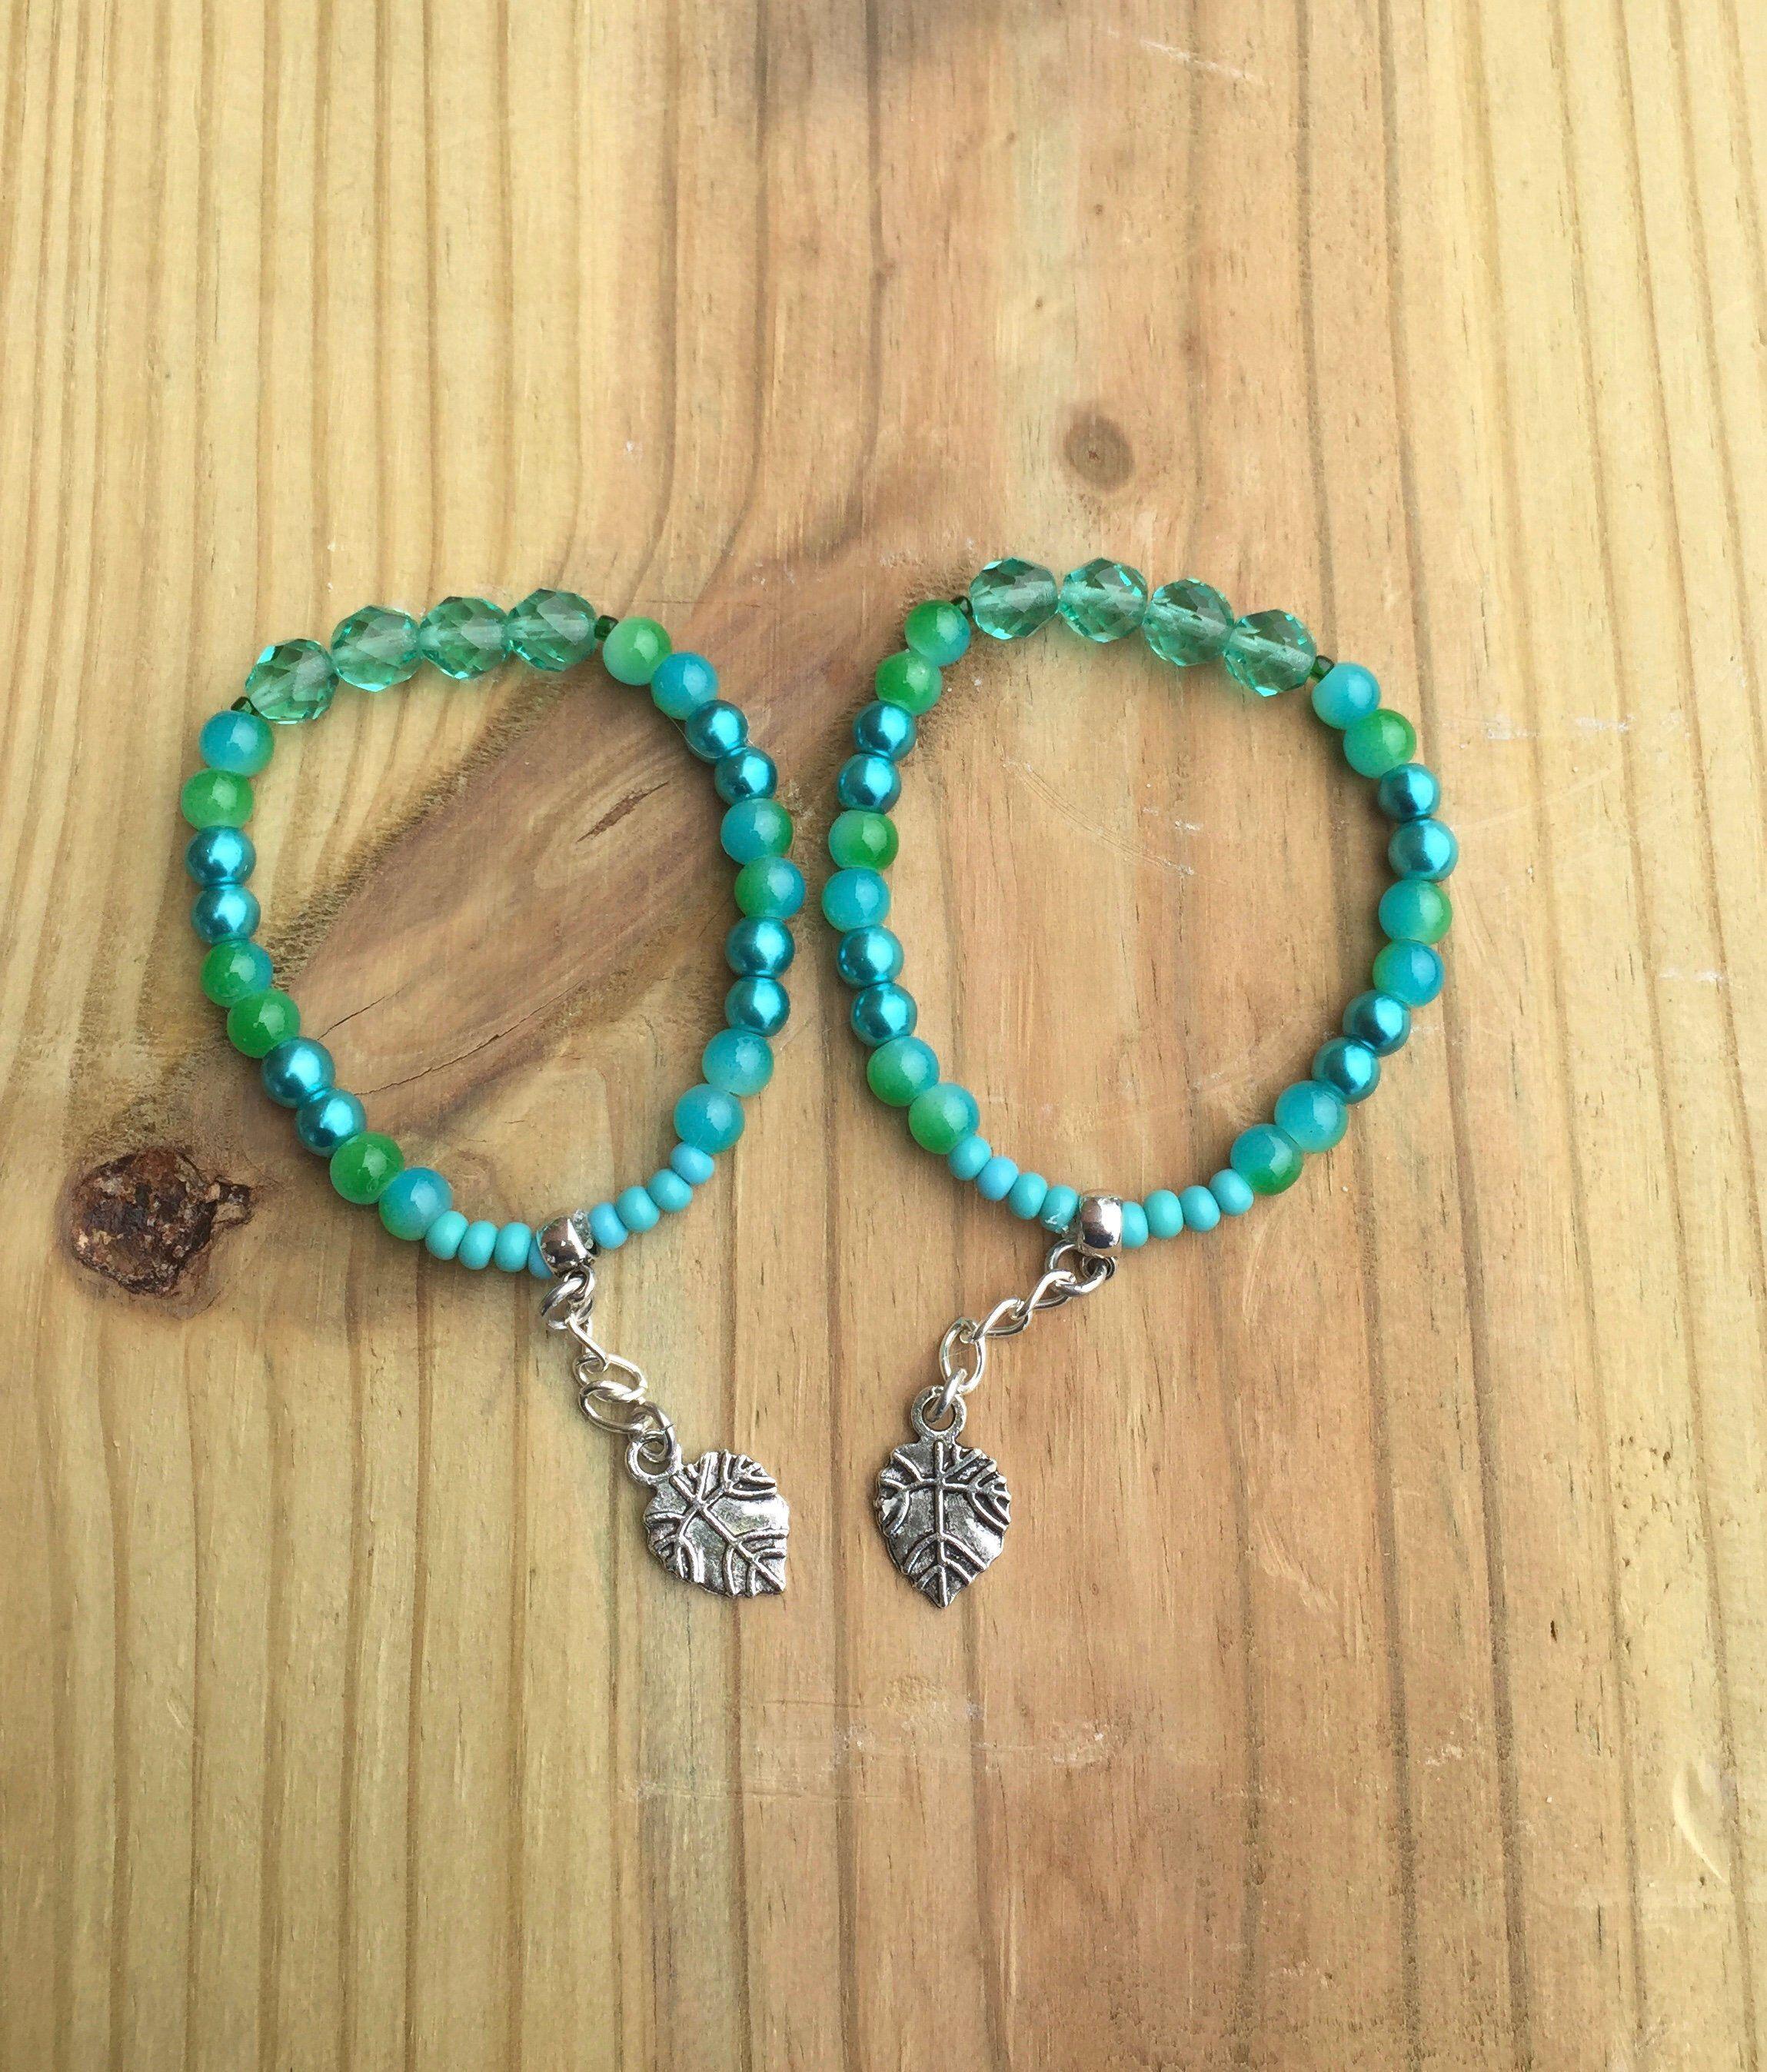 Aqua Blue Bracelets Stretchy Friendship Bracelet Set Glass